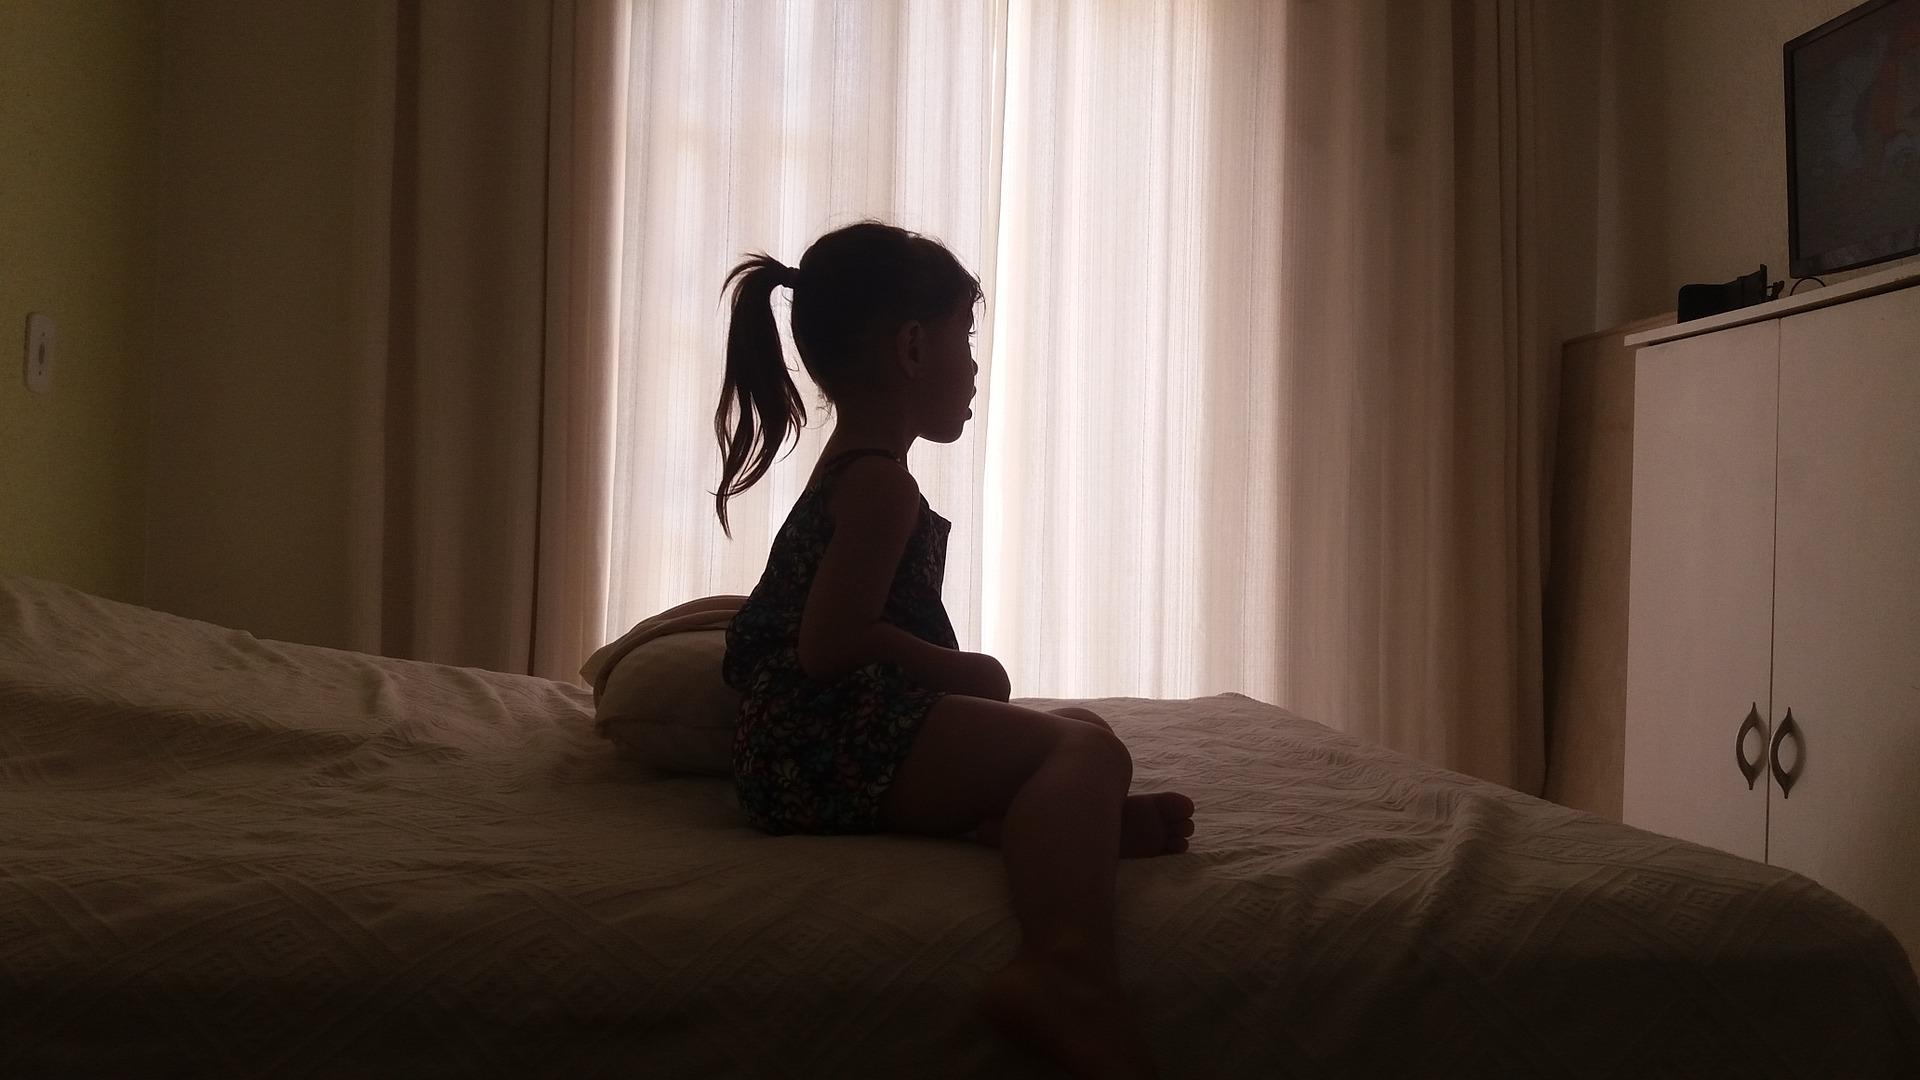 penteado-infantil-feminina